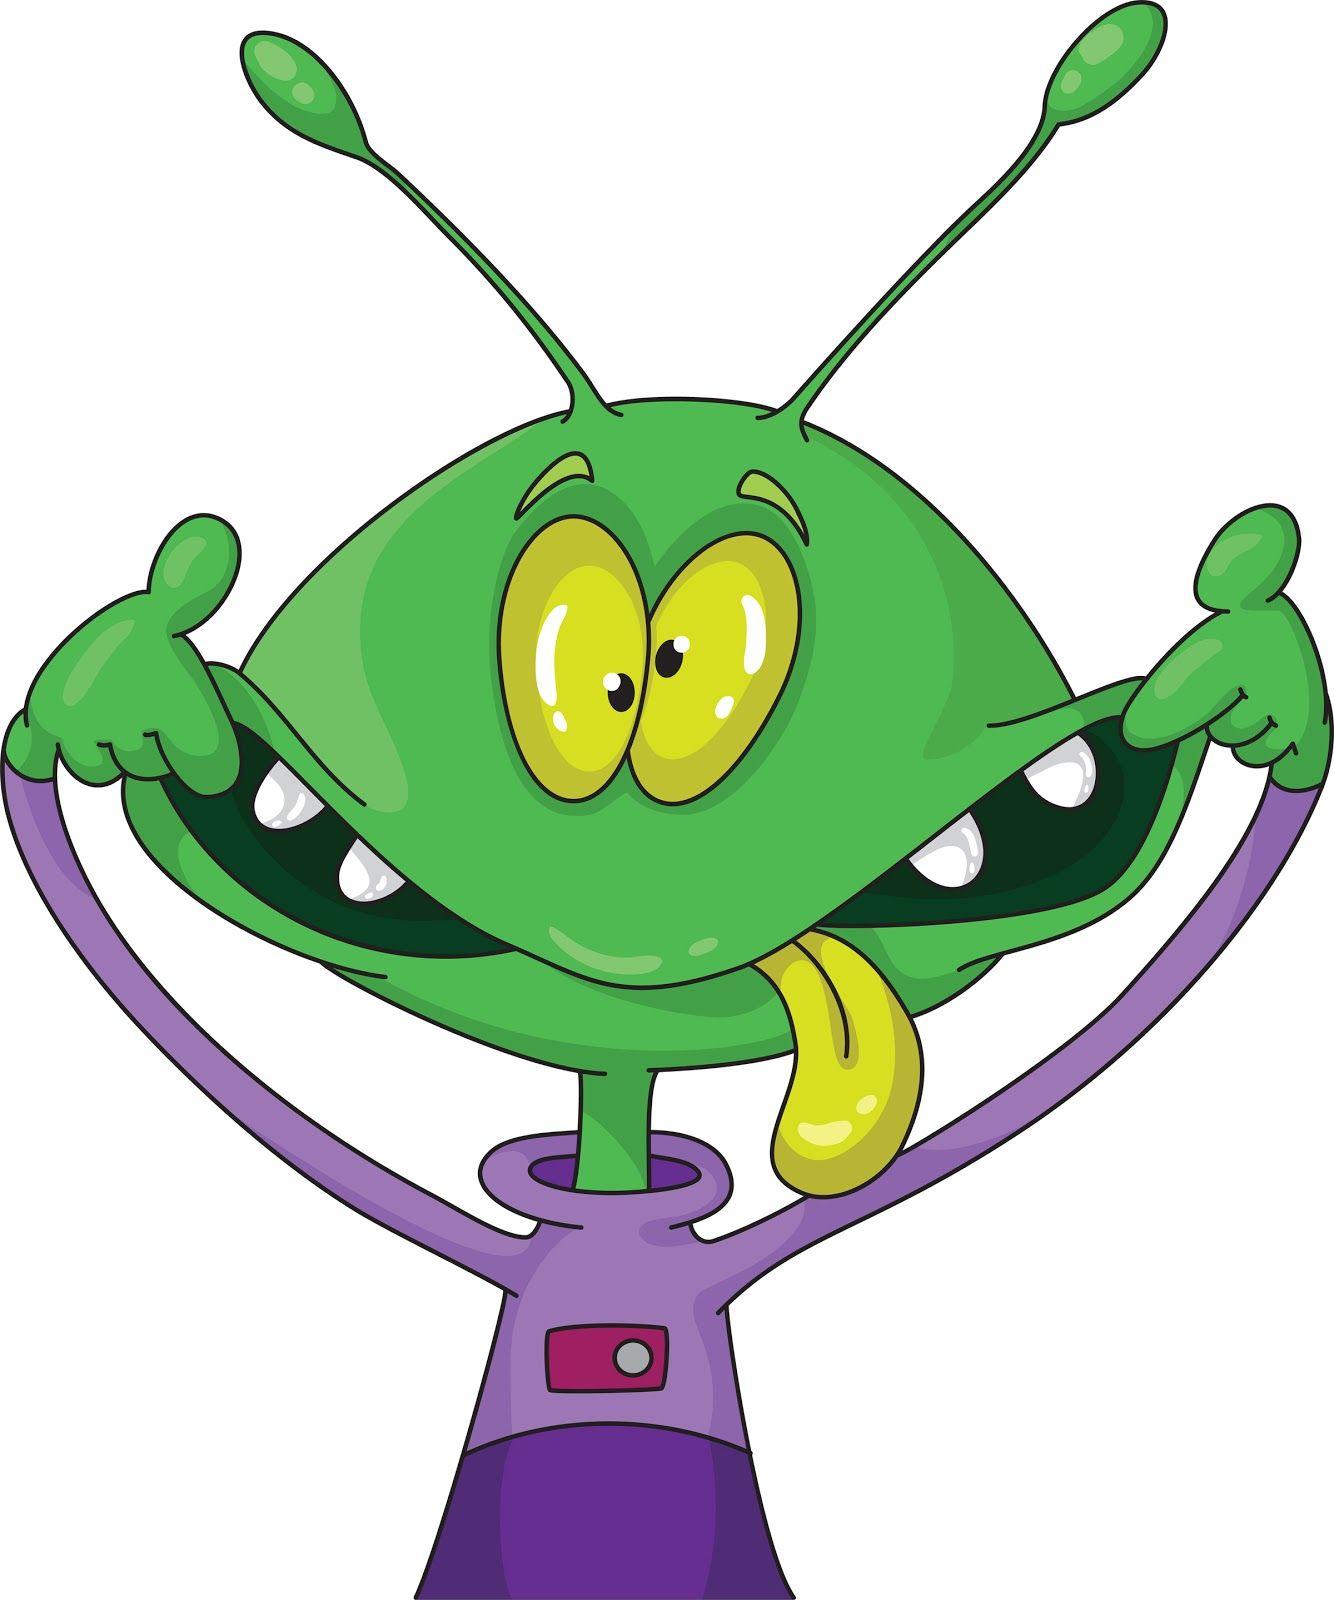 c1c9ff5ddd6b38195413d480d6a77b0f alien spaceship clipart alien rh pinterest com clipart valentine's chocolate clipart valentine day